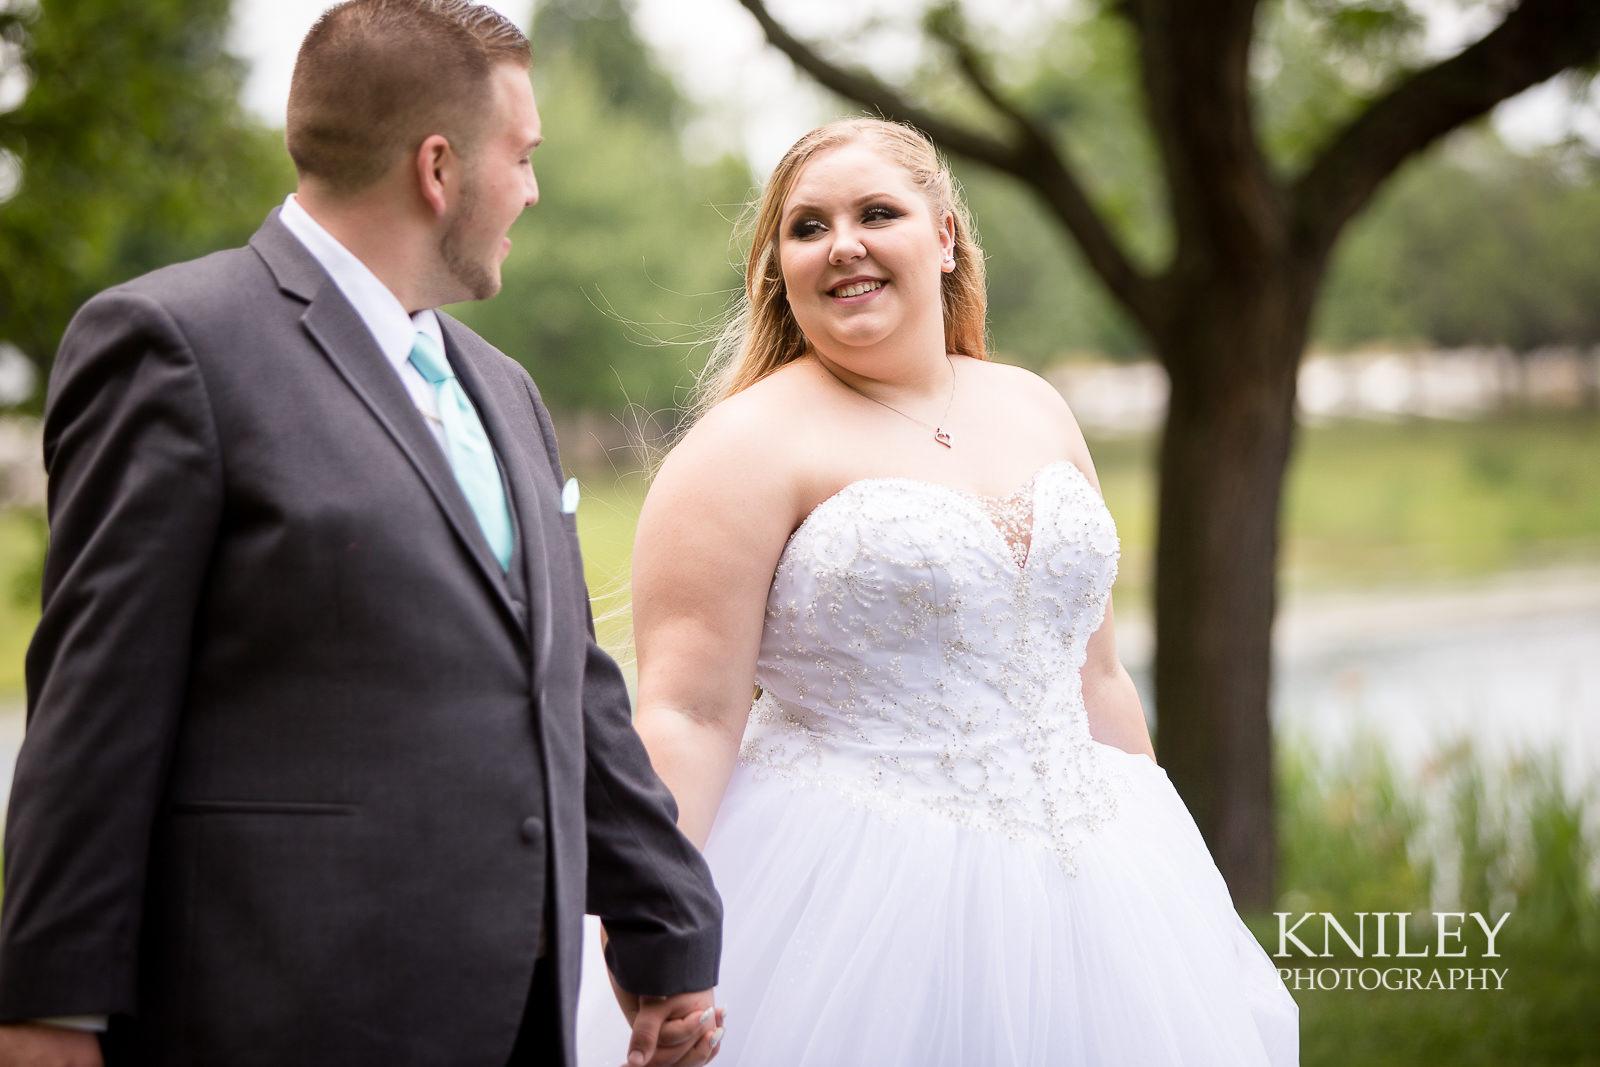 047 - North Ponds Park Wedding Picture - Webster NY - IMG_6915.jpg